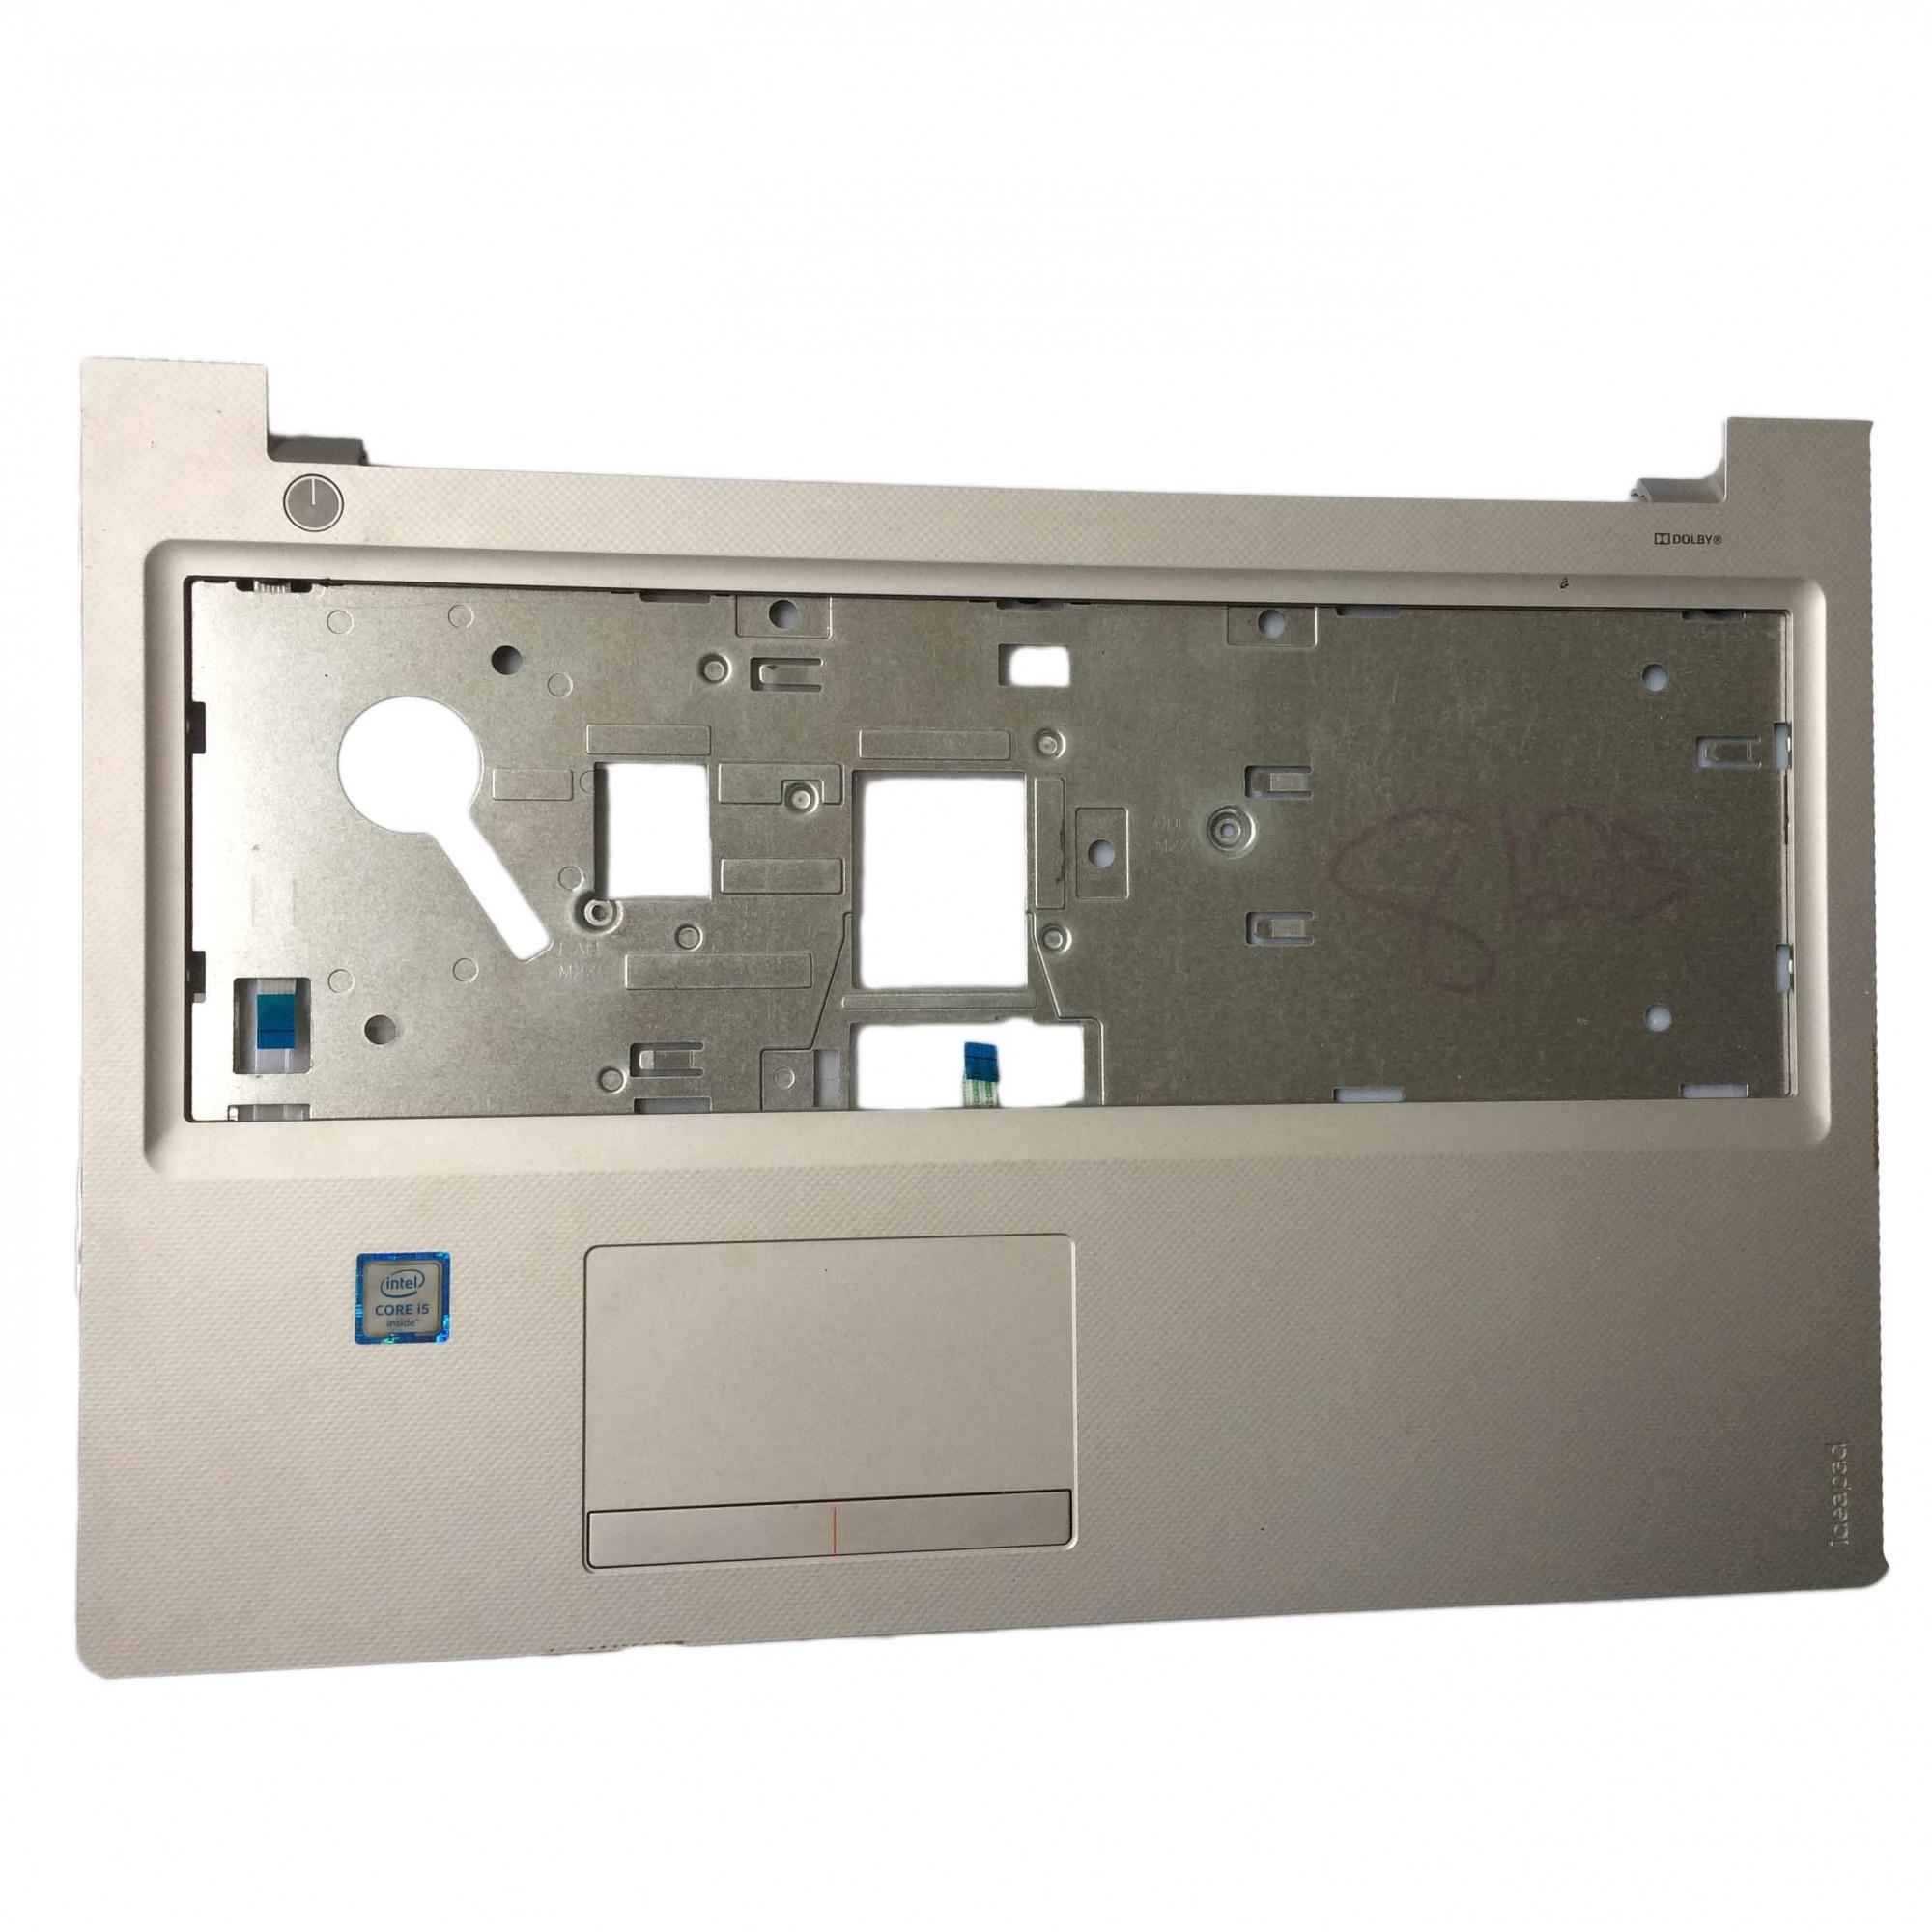 Carcaça Base Superior + TouchPad + Botão Power + Flats Notebook Lenovo Ideapad 300-15ISK PN:AP0YM000100 PID08030 - Retirado